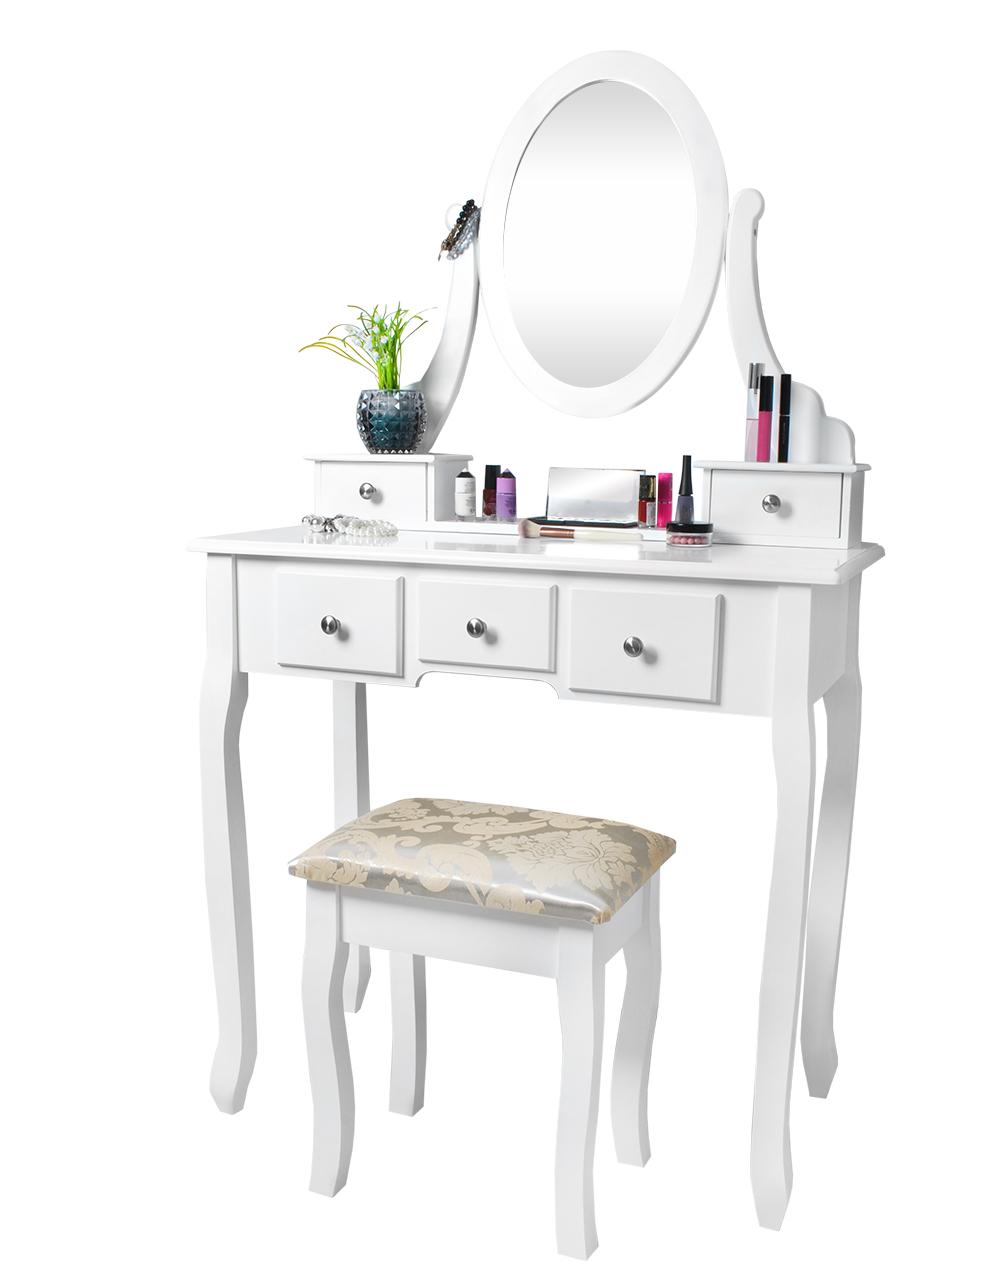 kosmetiktisch schminktisch schminkkommode hocker spiegel 4647 ebay. Black Bedroom Furniture Sets. Home Design Ideas